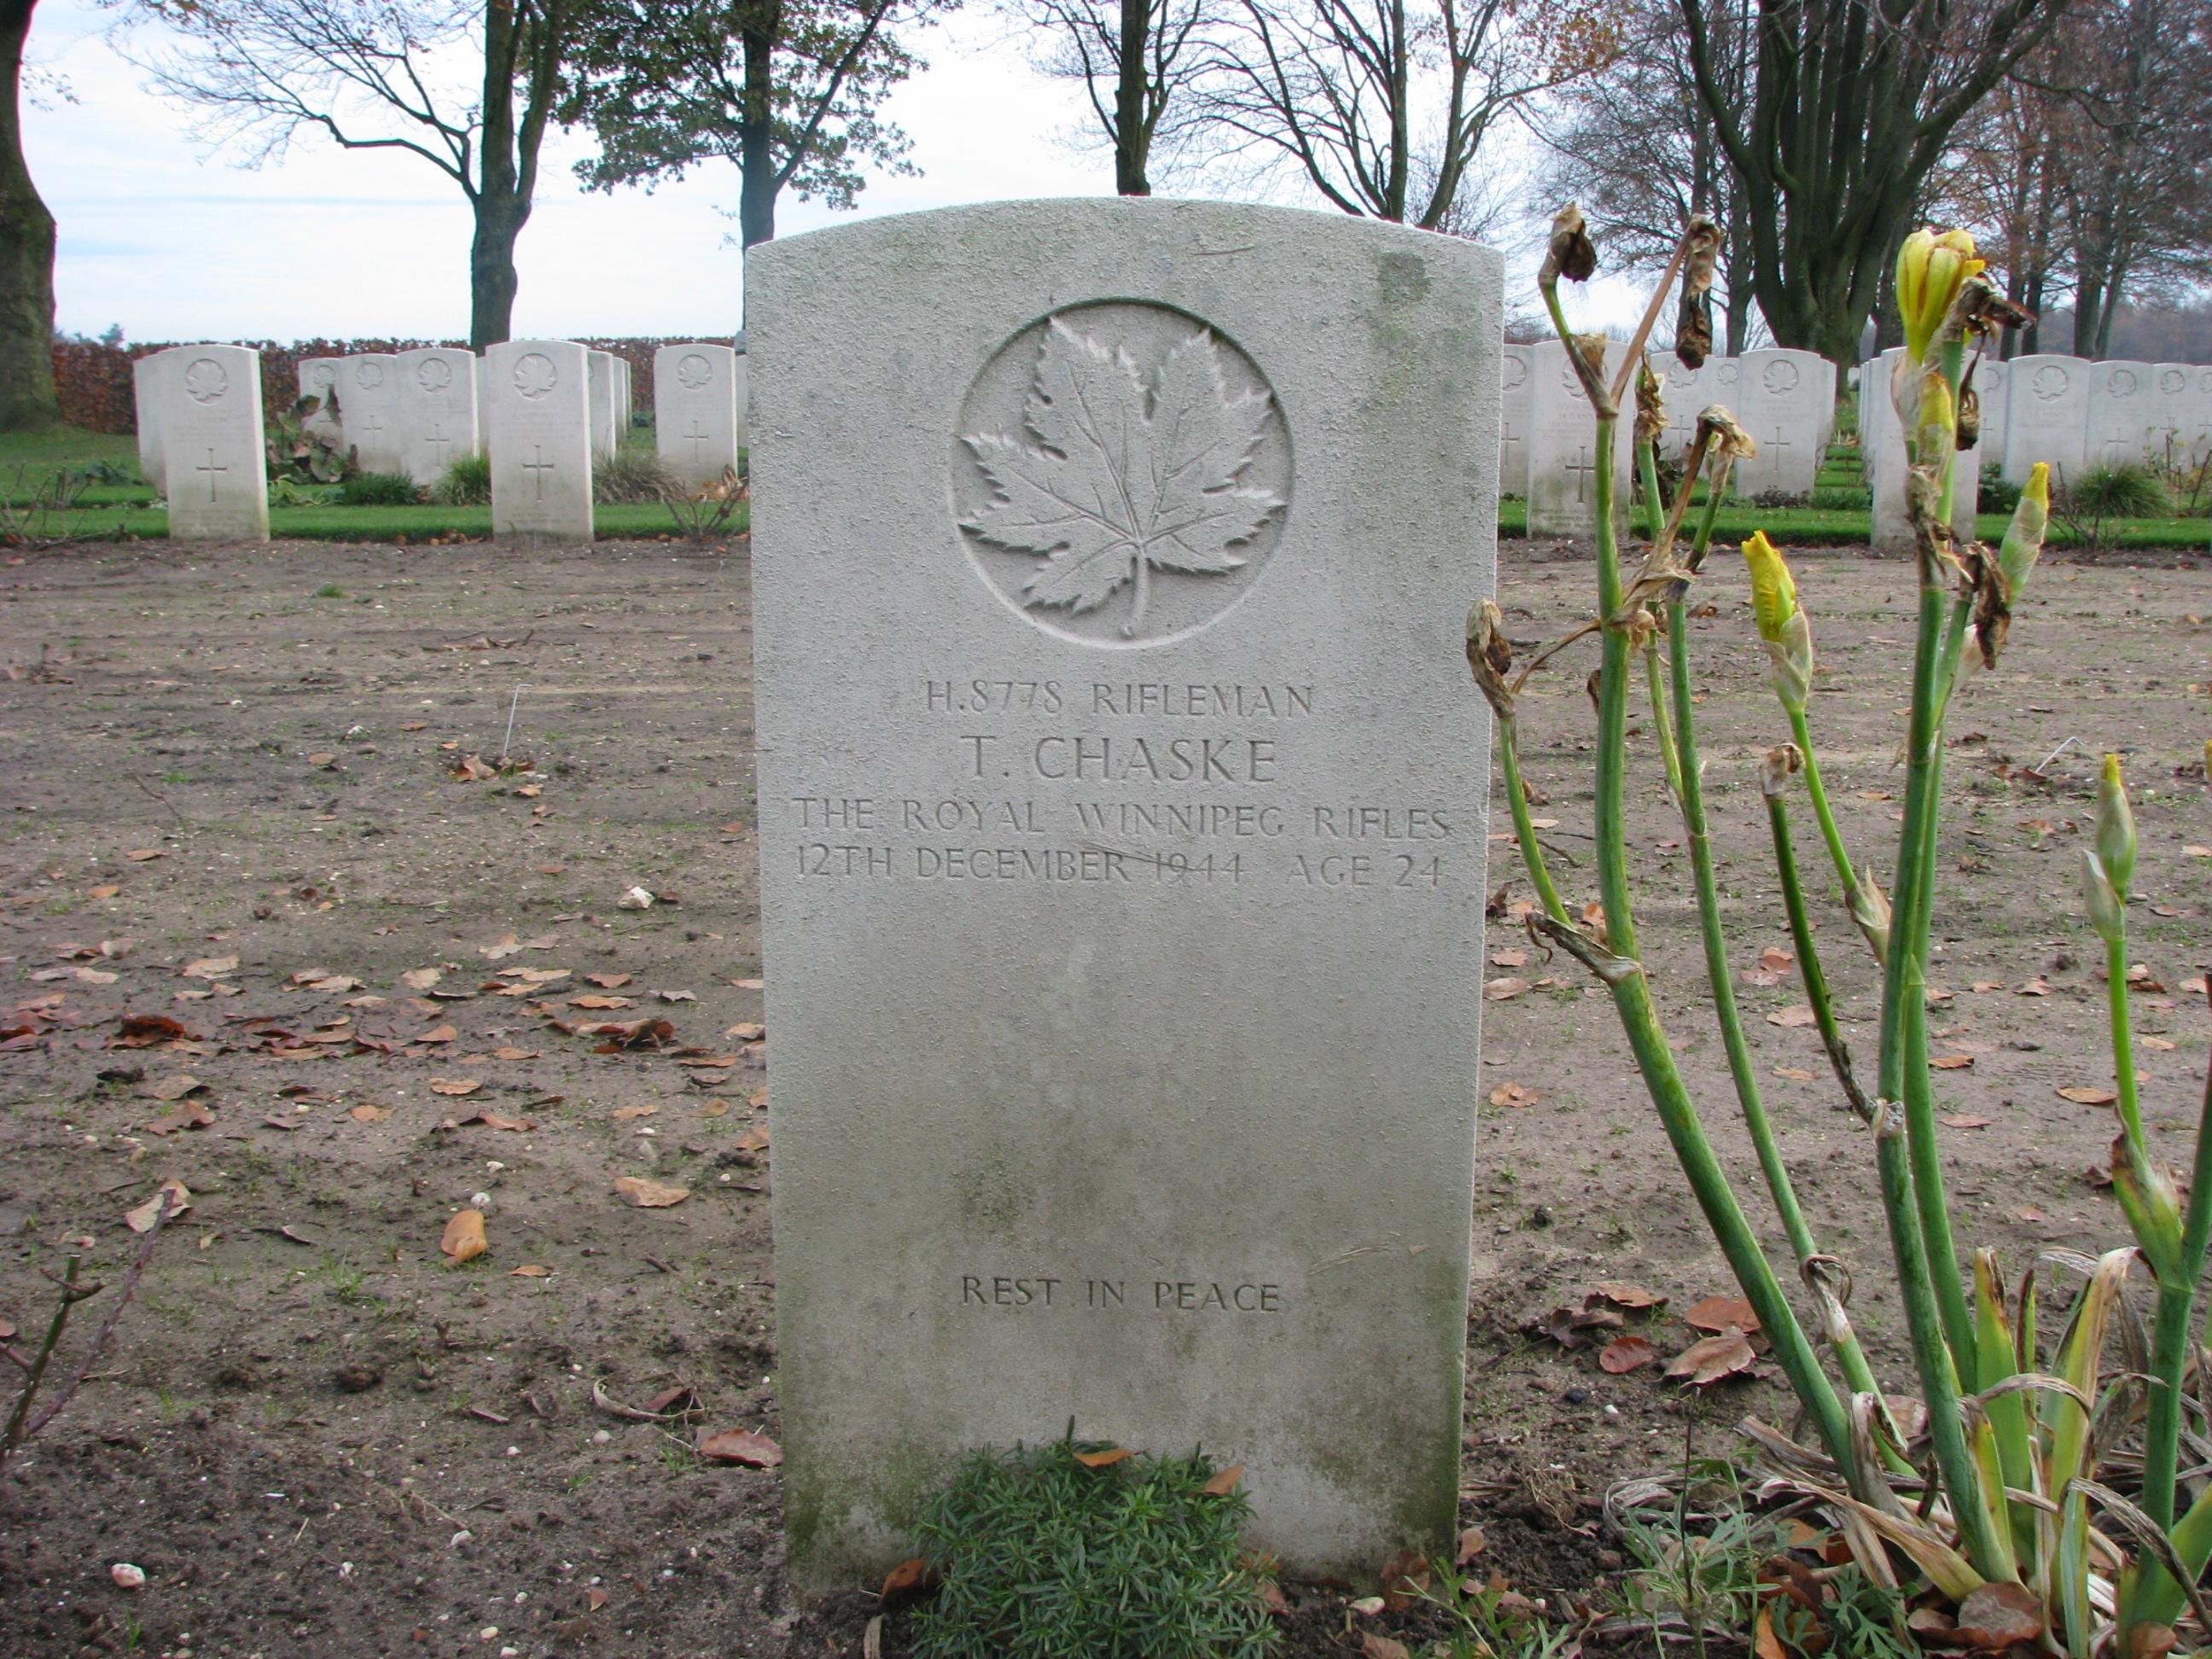 Rifleman Tom Chaske gravestone at Groesbeek